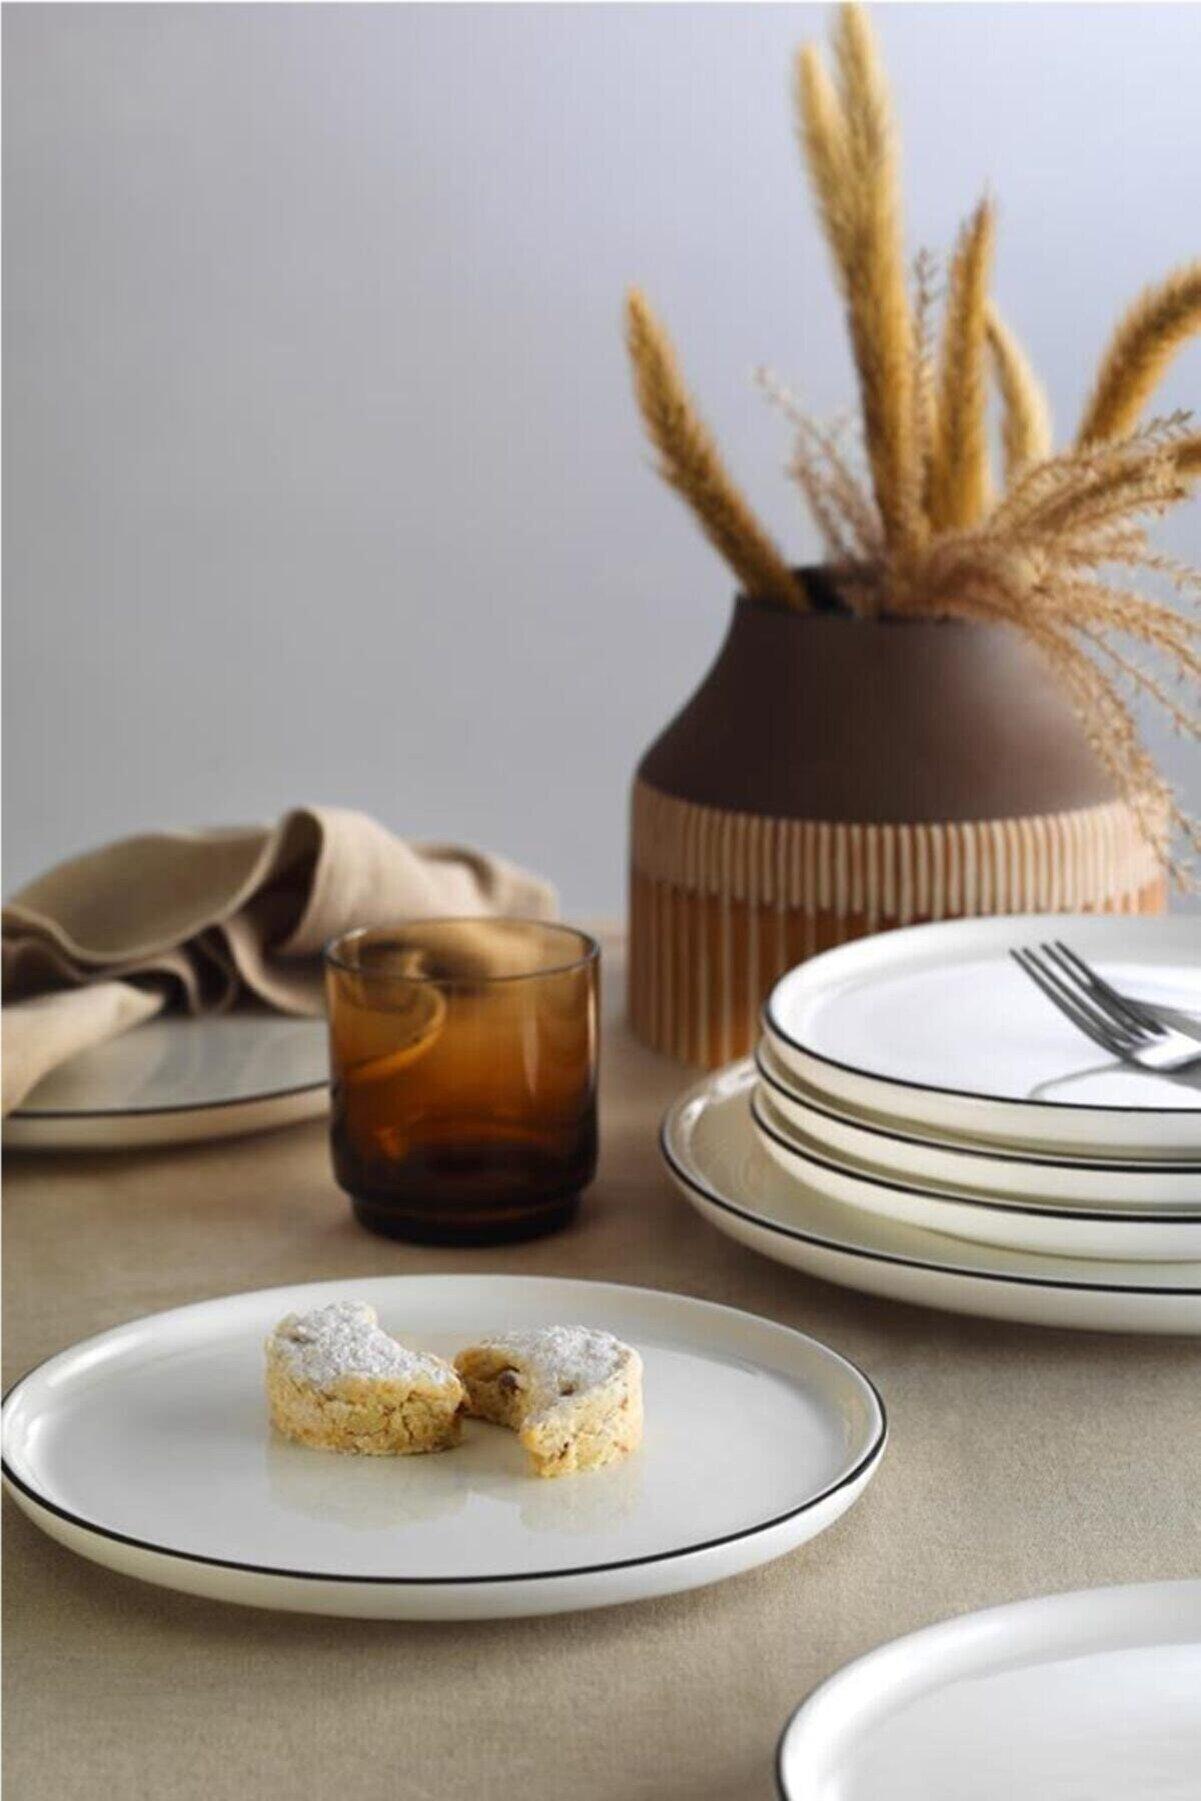 Kütahya Porselen Seramik 21 Cm Siyah Fileli Pasta Tabağı (6 Adet)